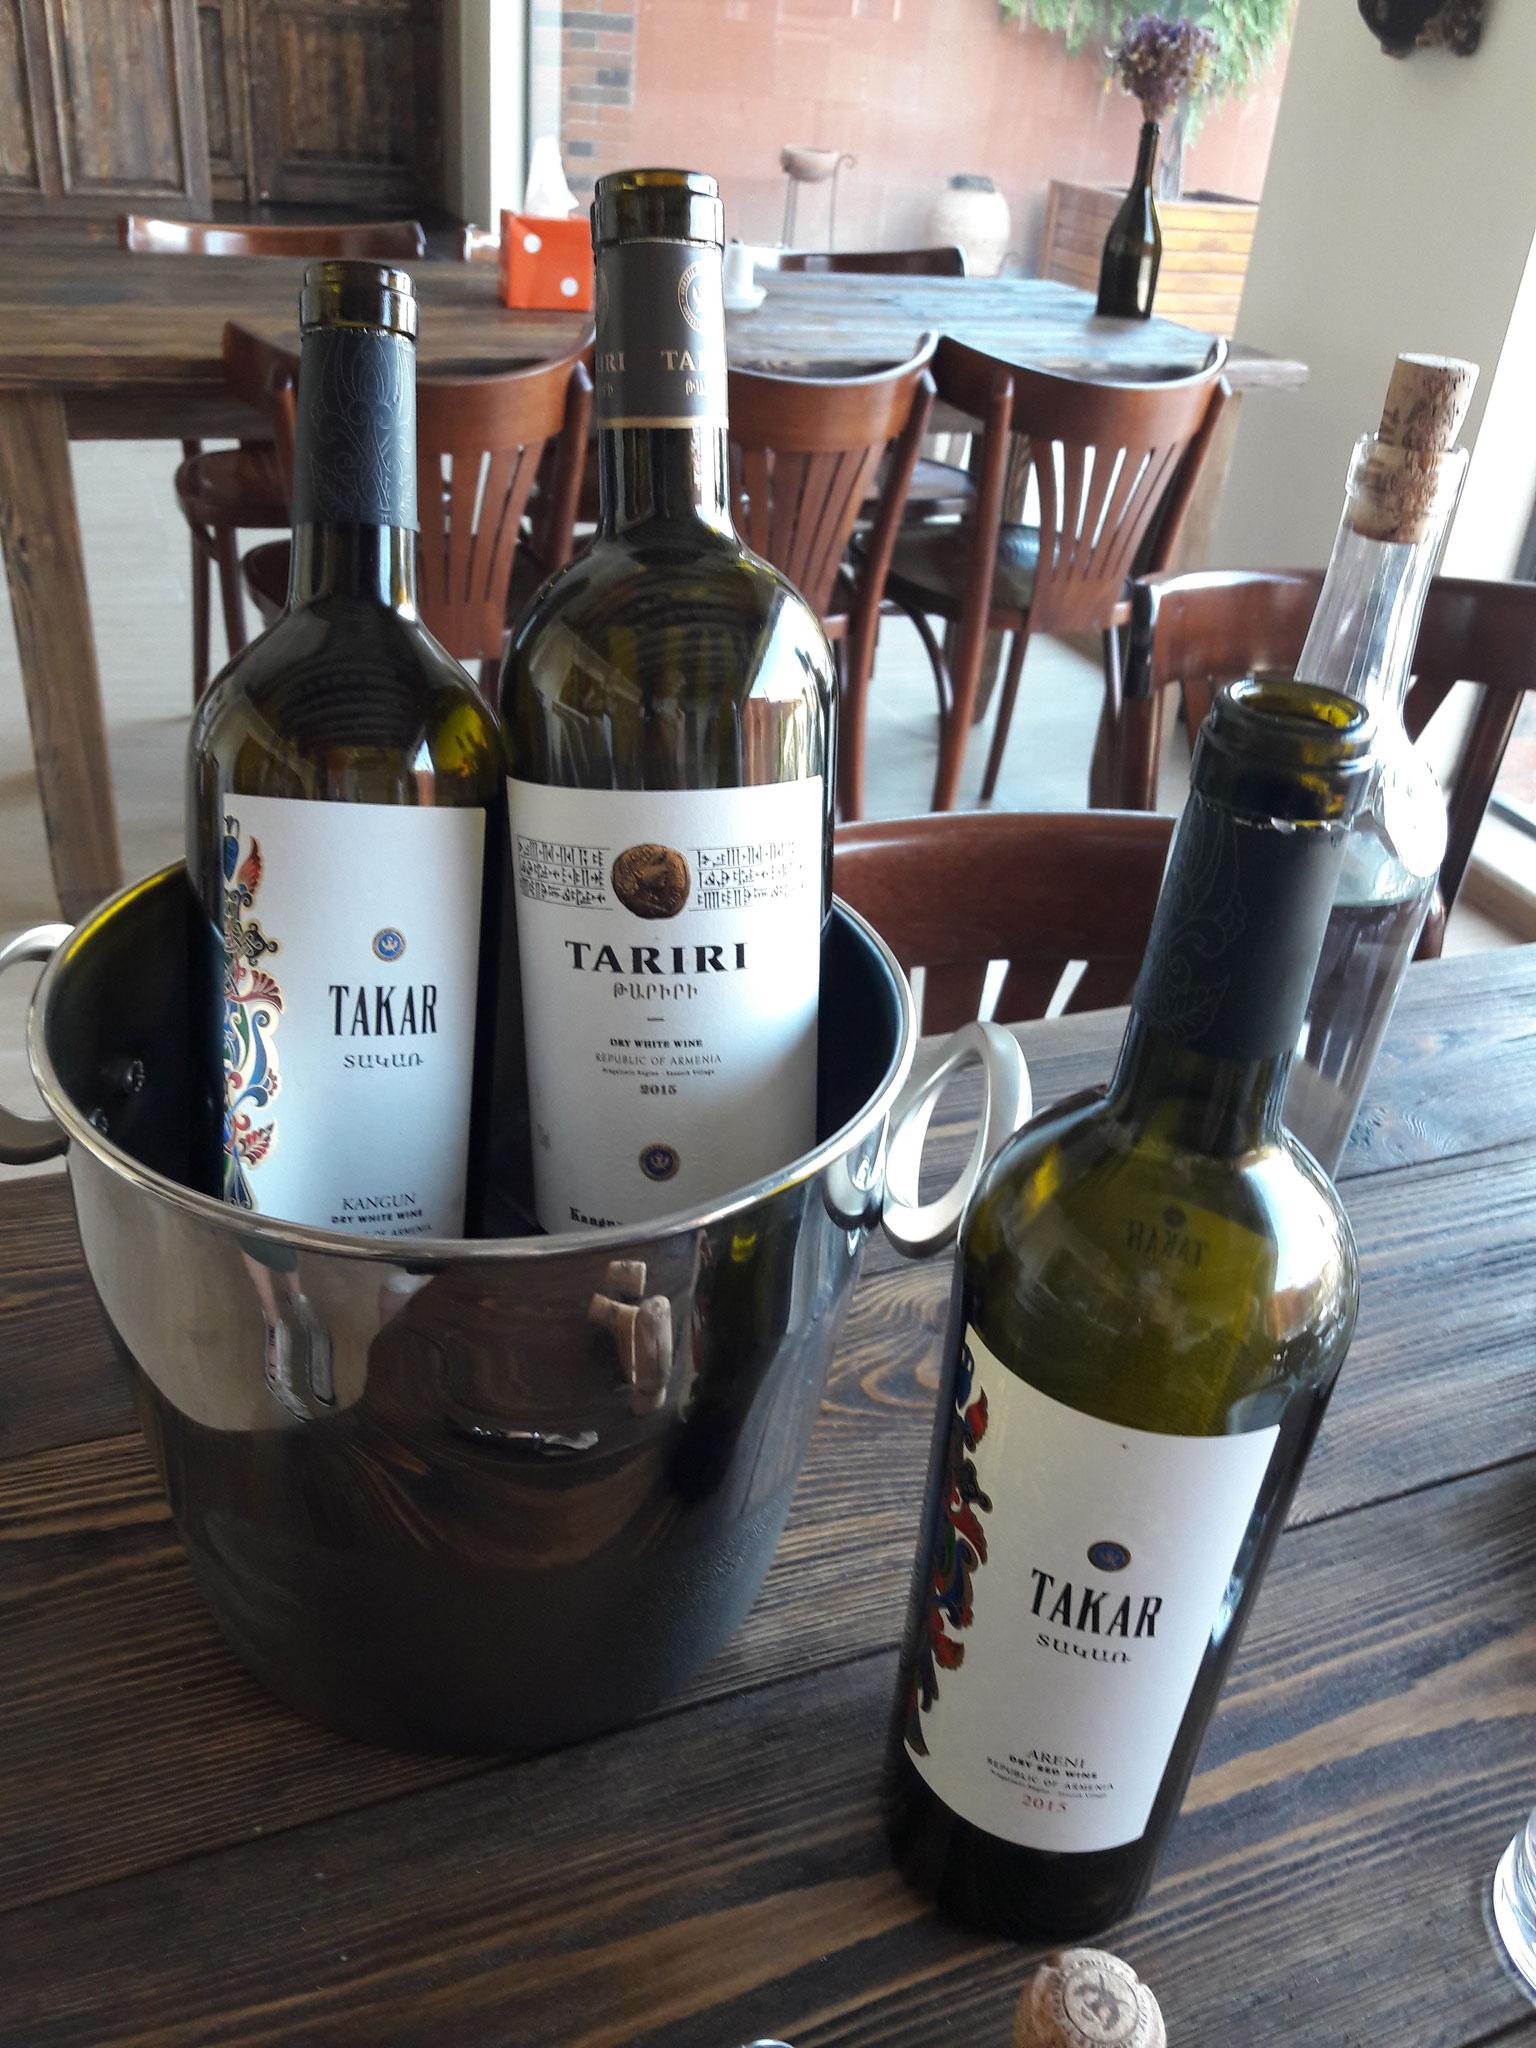 Weinprobe bei der Armenia Wine Company